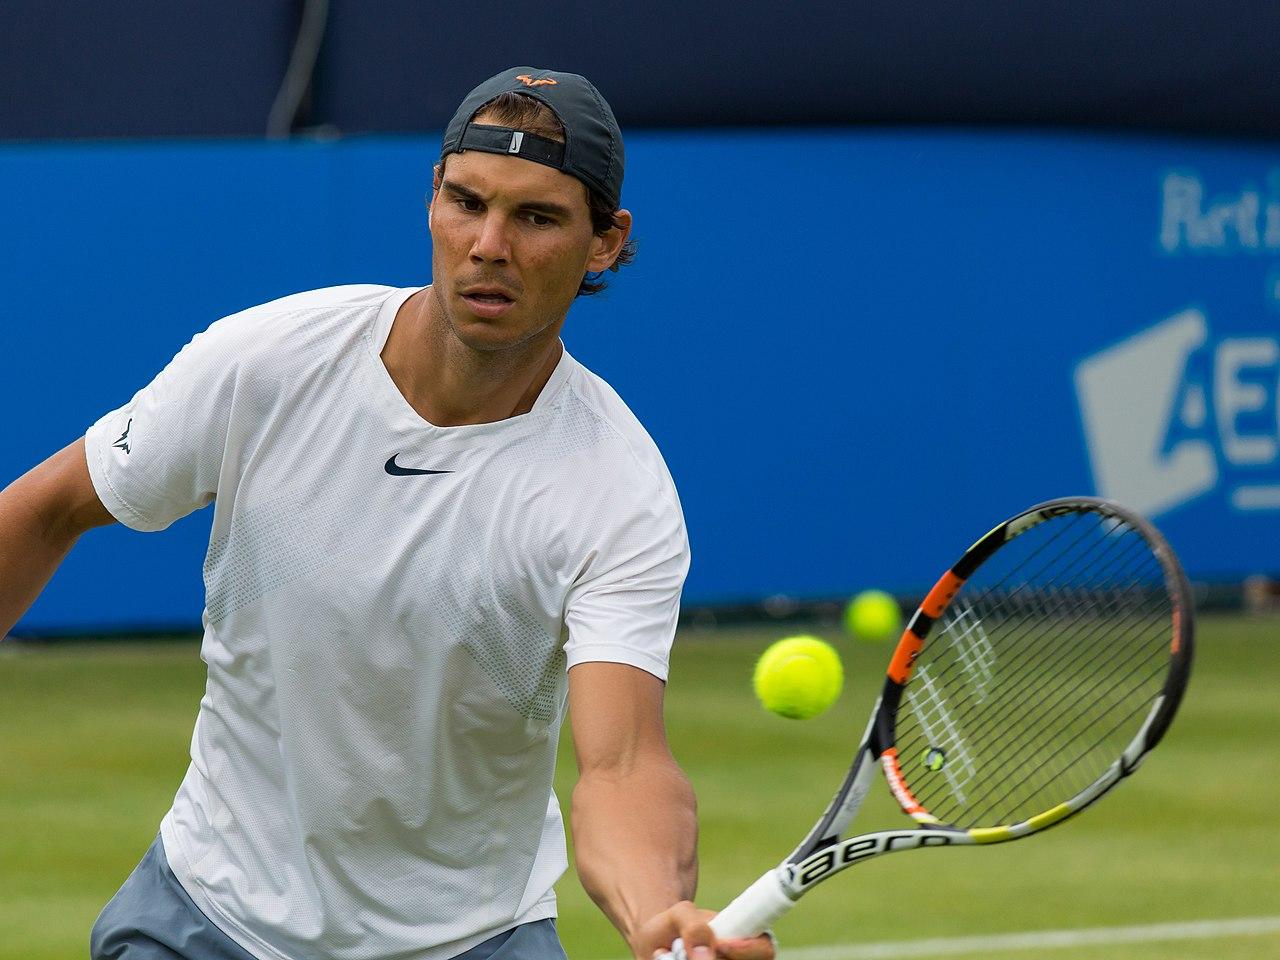 Nadal Wikipedia: Súbor:Rafael Nadal 5, Aegon Championships, London, UK